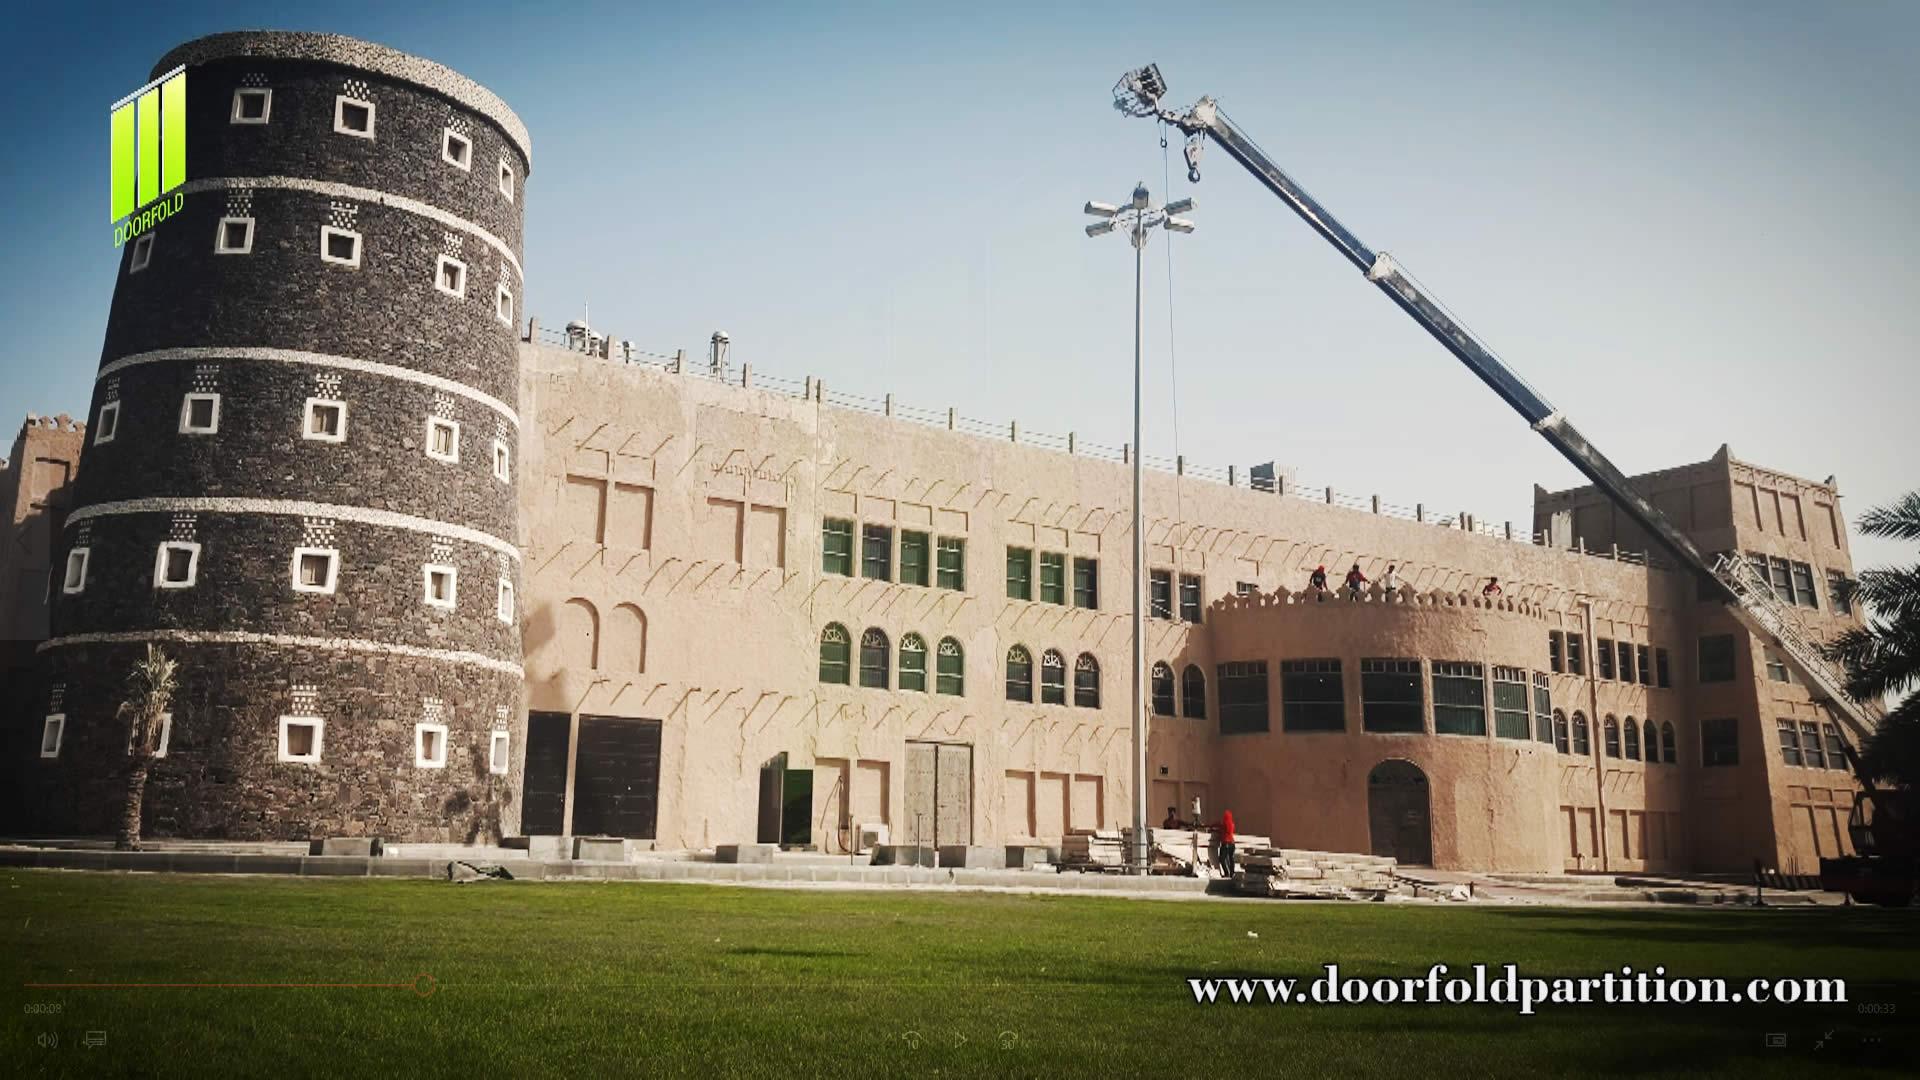 The Heritage Village 2nd Floor of Dammam Saudi Arabia